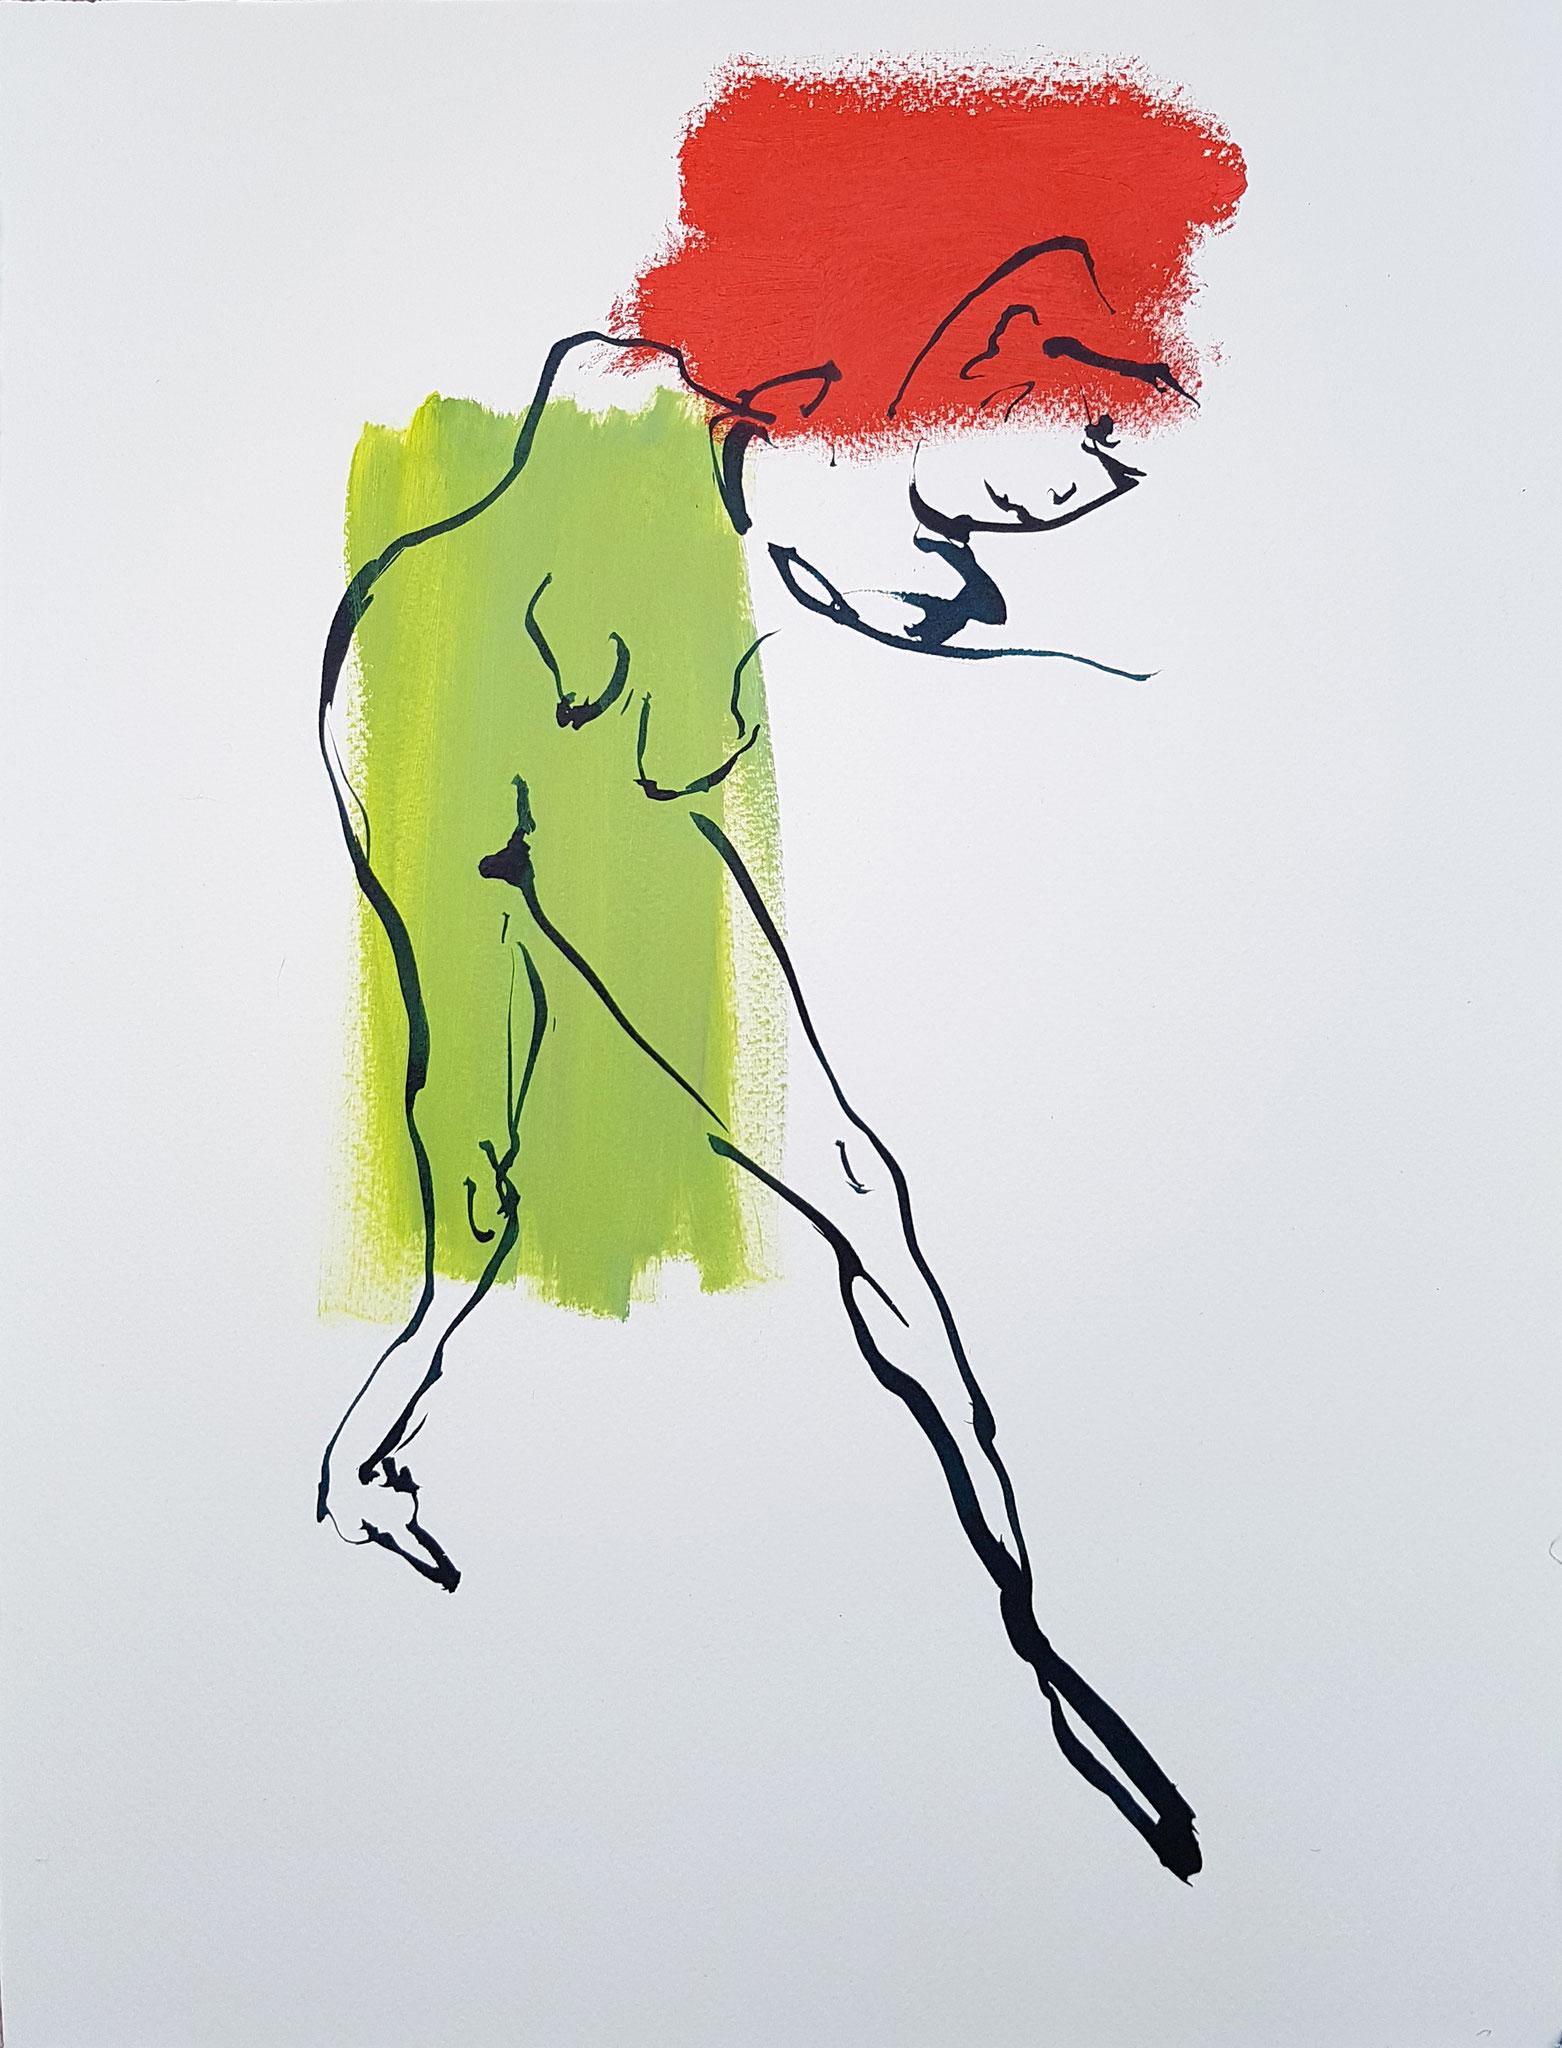 Schritt (Acrylic, Ink, on Paper, 48x36cm)